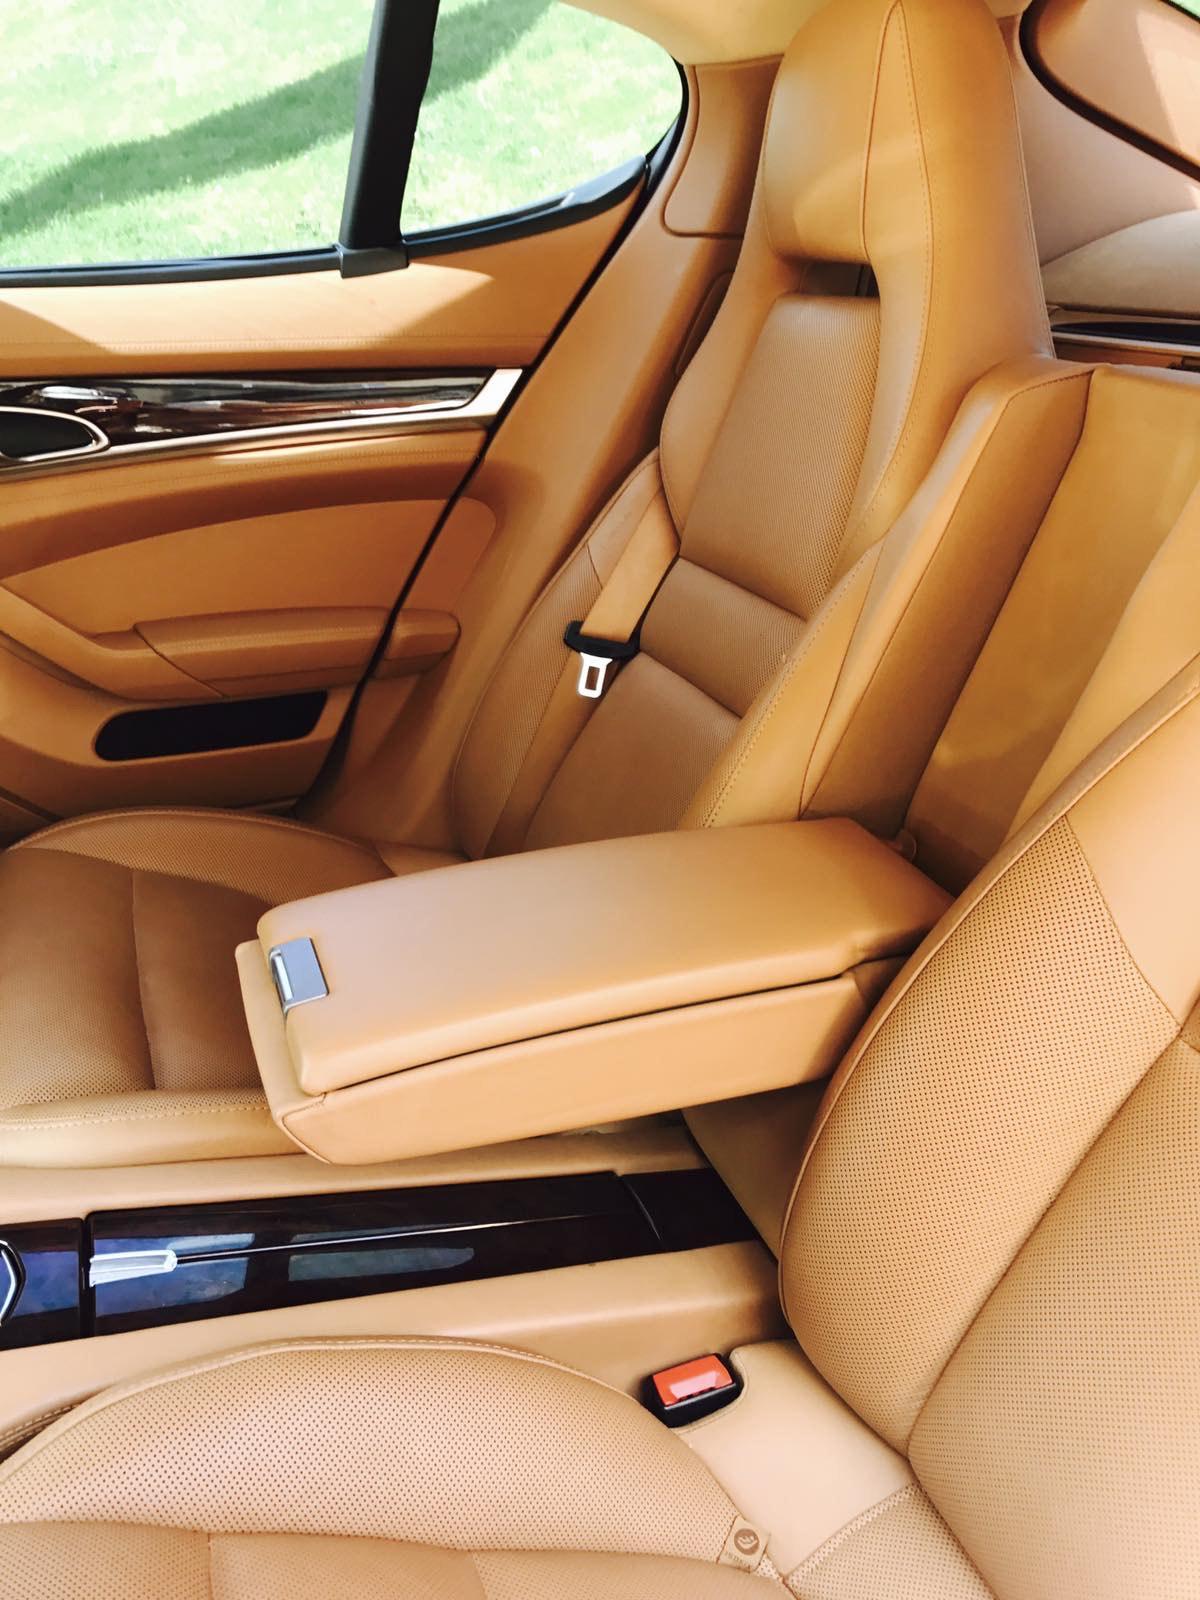 cabriolet, sports car rental in Kiev Porsche Panamera (6)